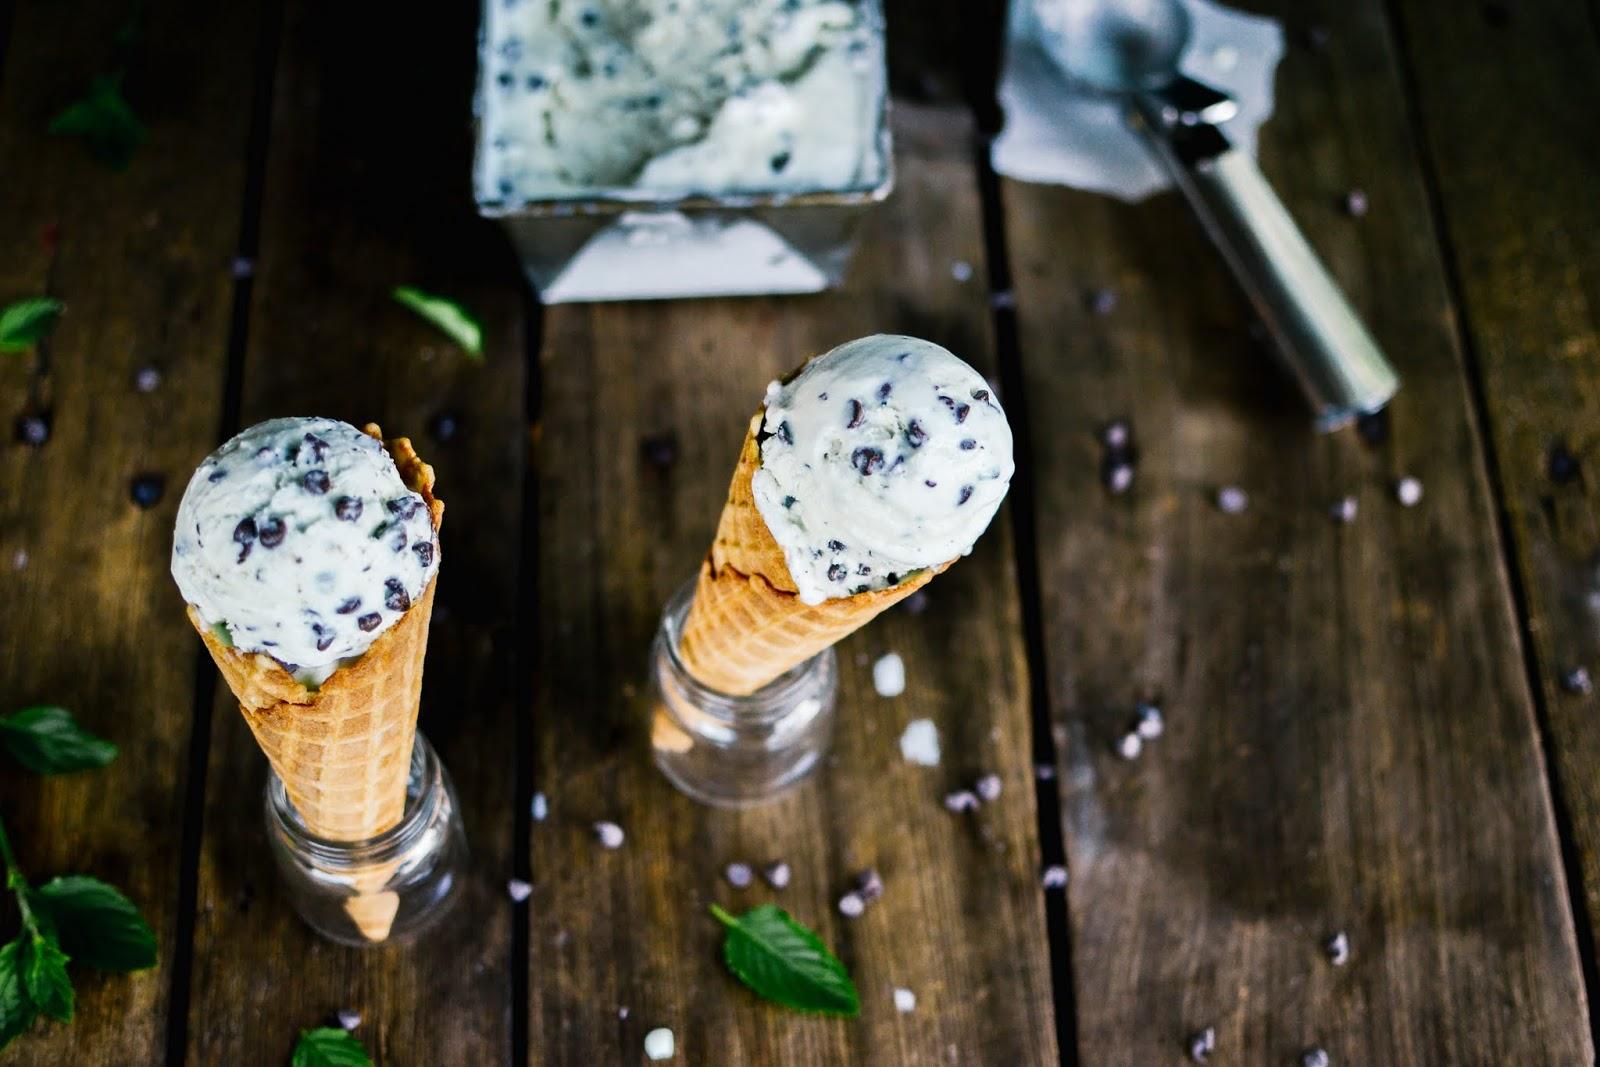 mintchip+icecream-1.jpg